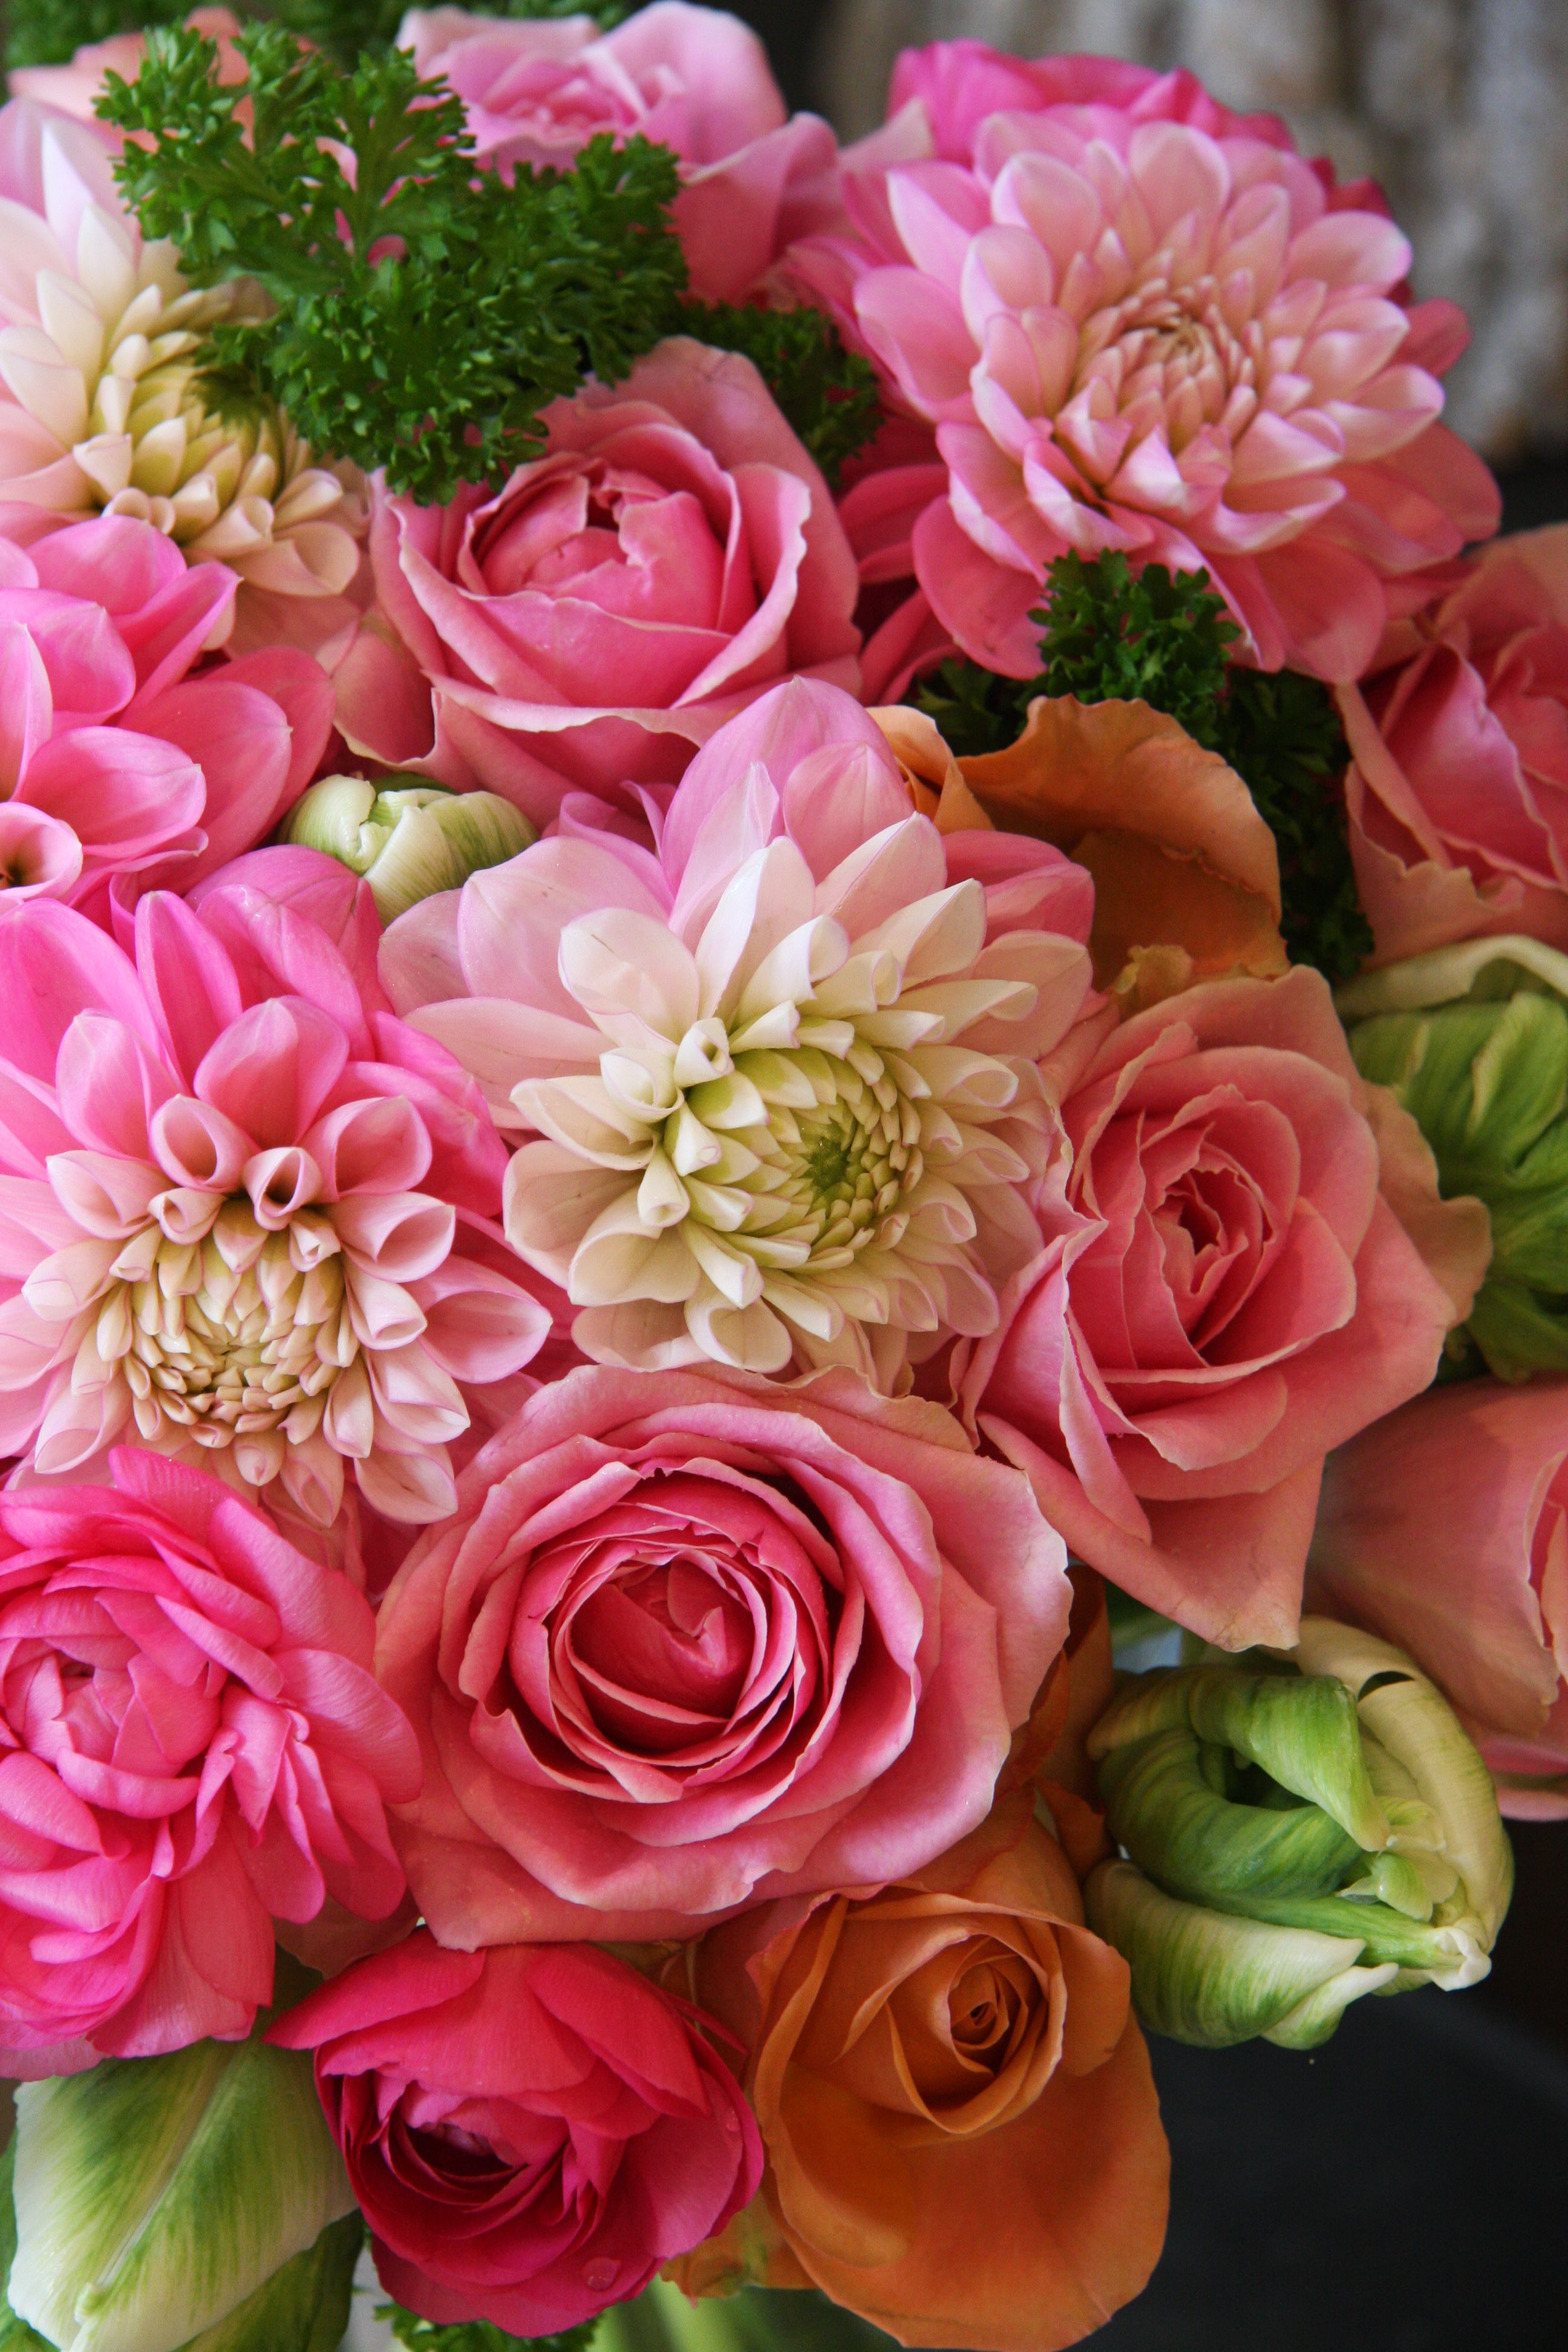 Dahlia, Rose, Ranunculus and Tulip. ~ Sent from Mom 2/28/15.